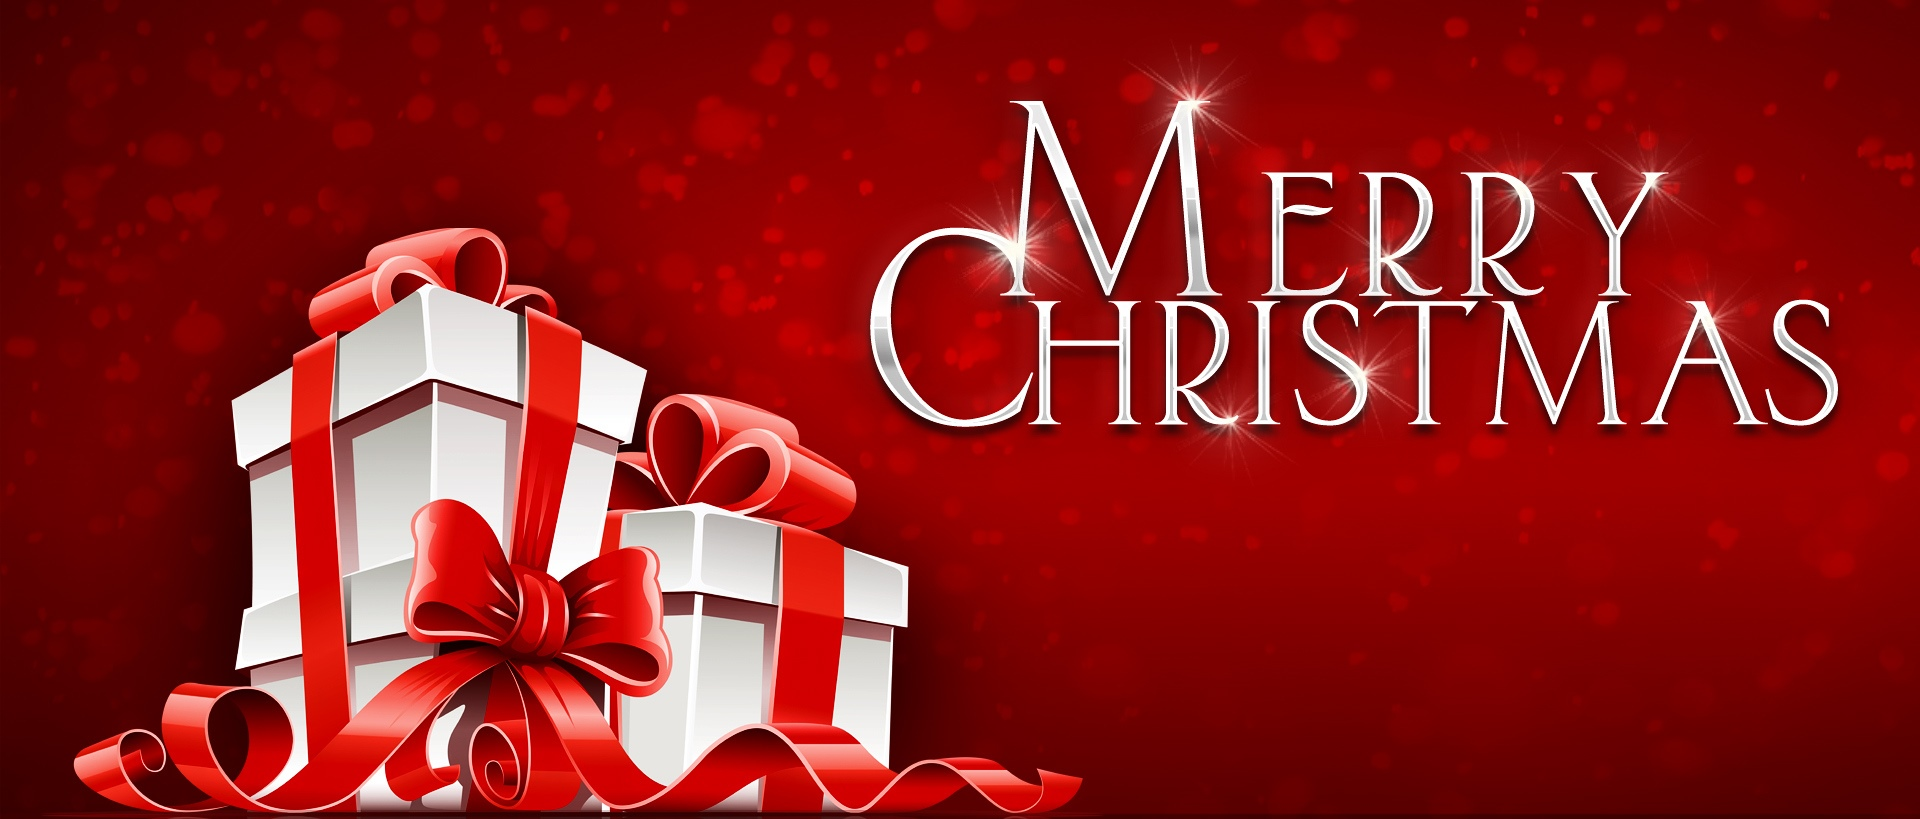 merry_christmas_2